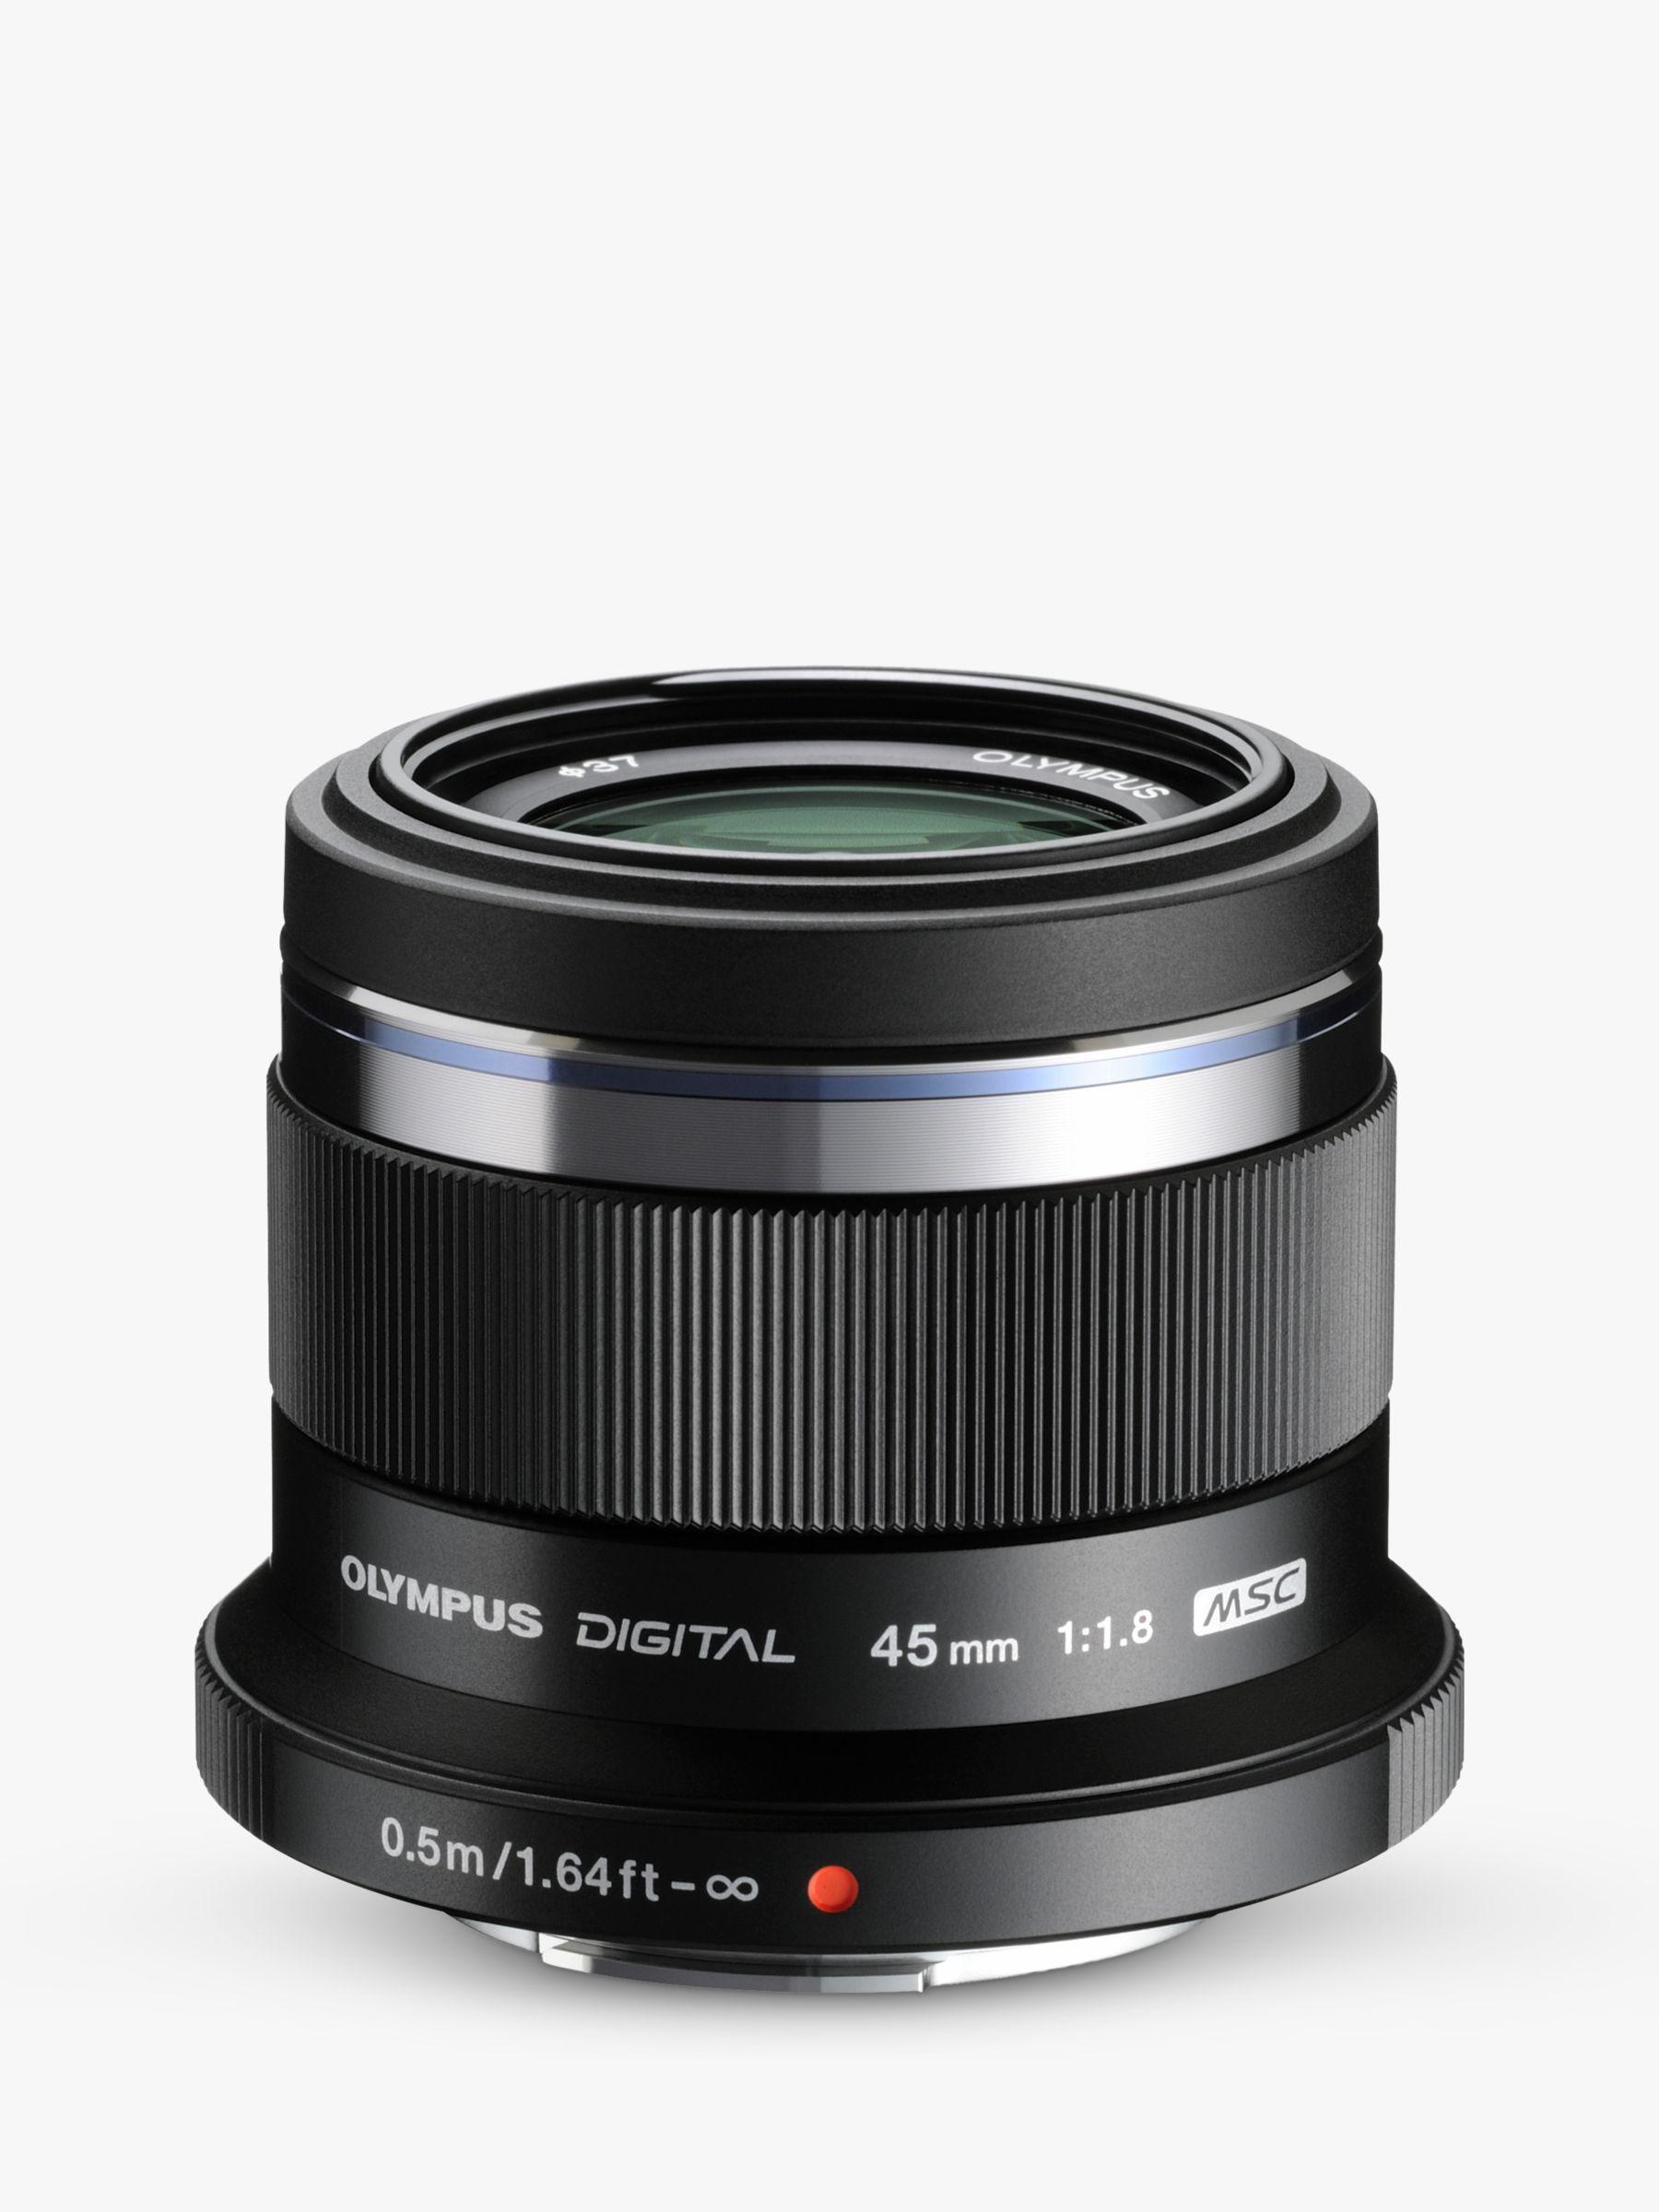 Olympus Olympus M.ZUIKO DIGITAL 45mm f/1.8G Standard Lens